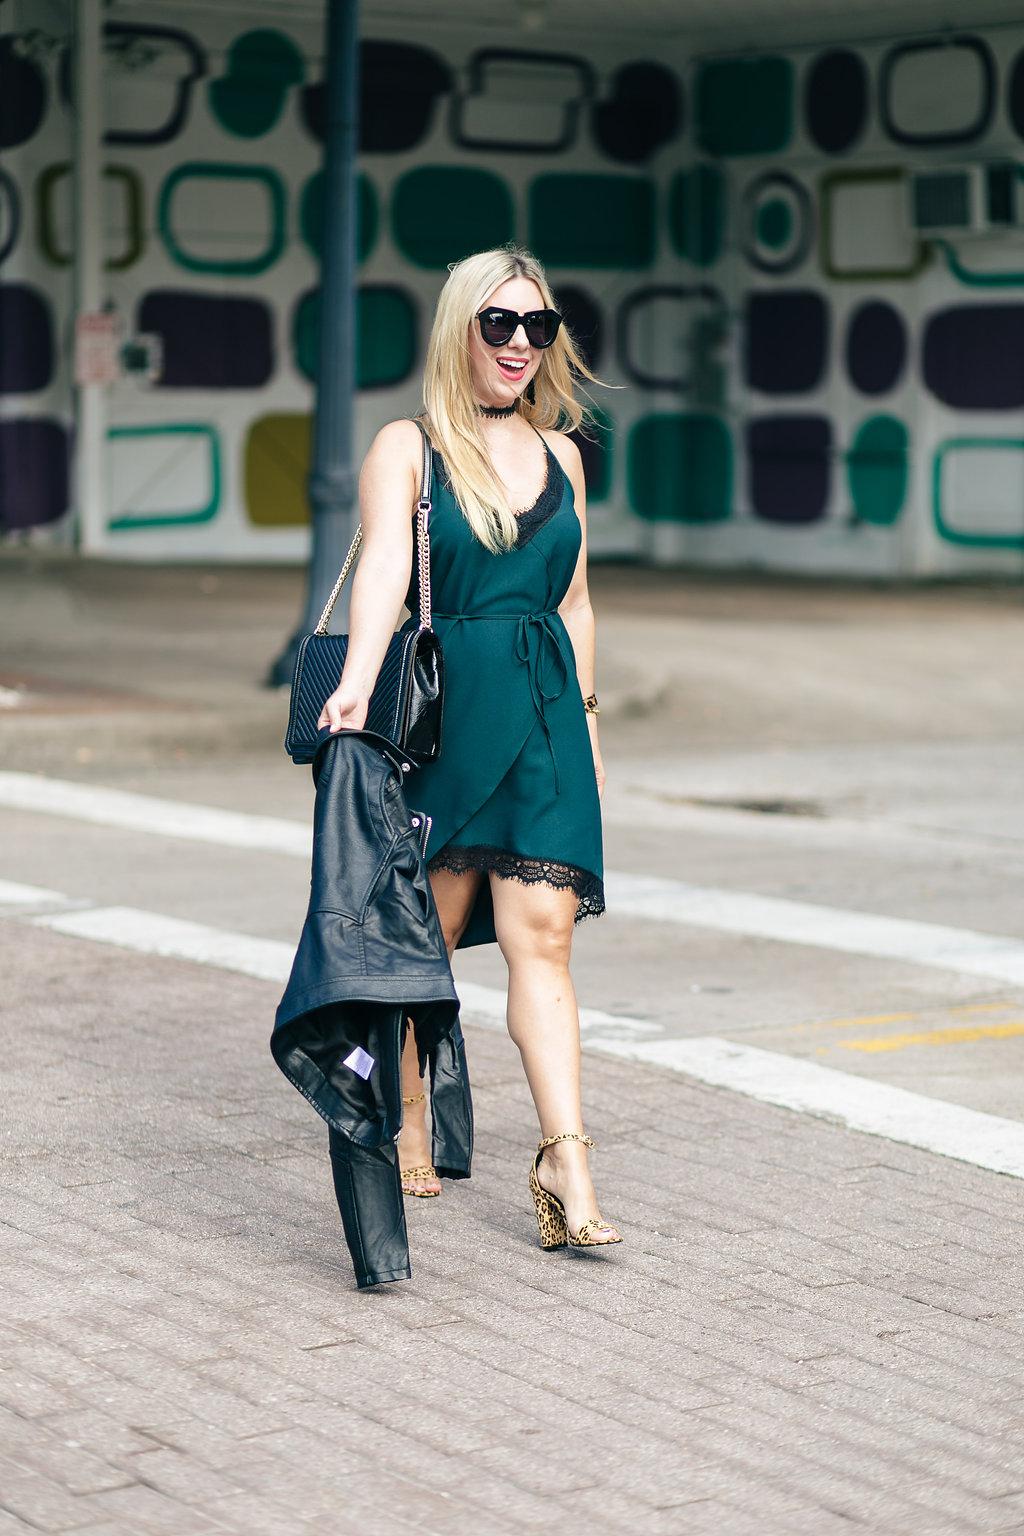 Fall Fashion | Slip Dress